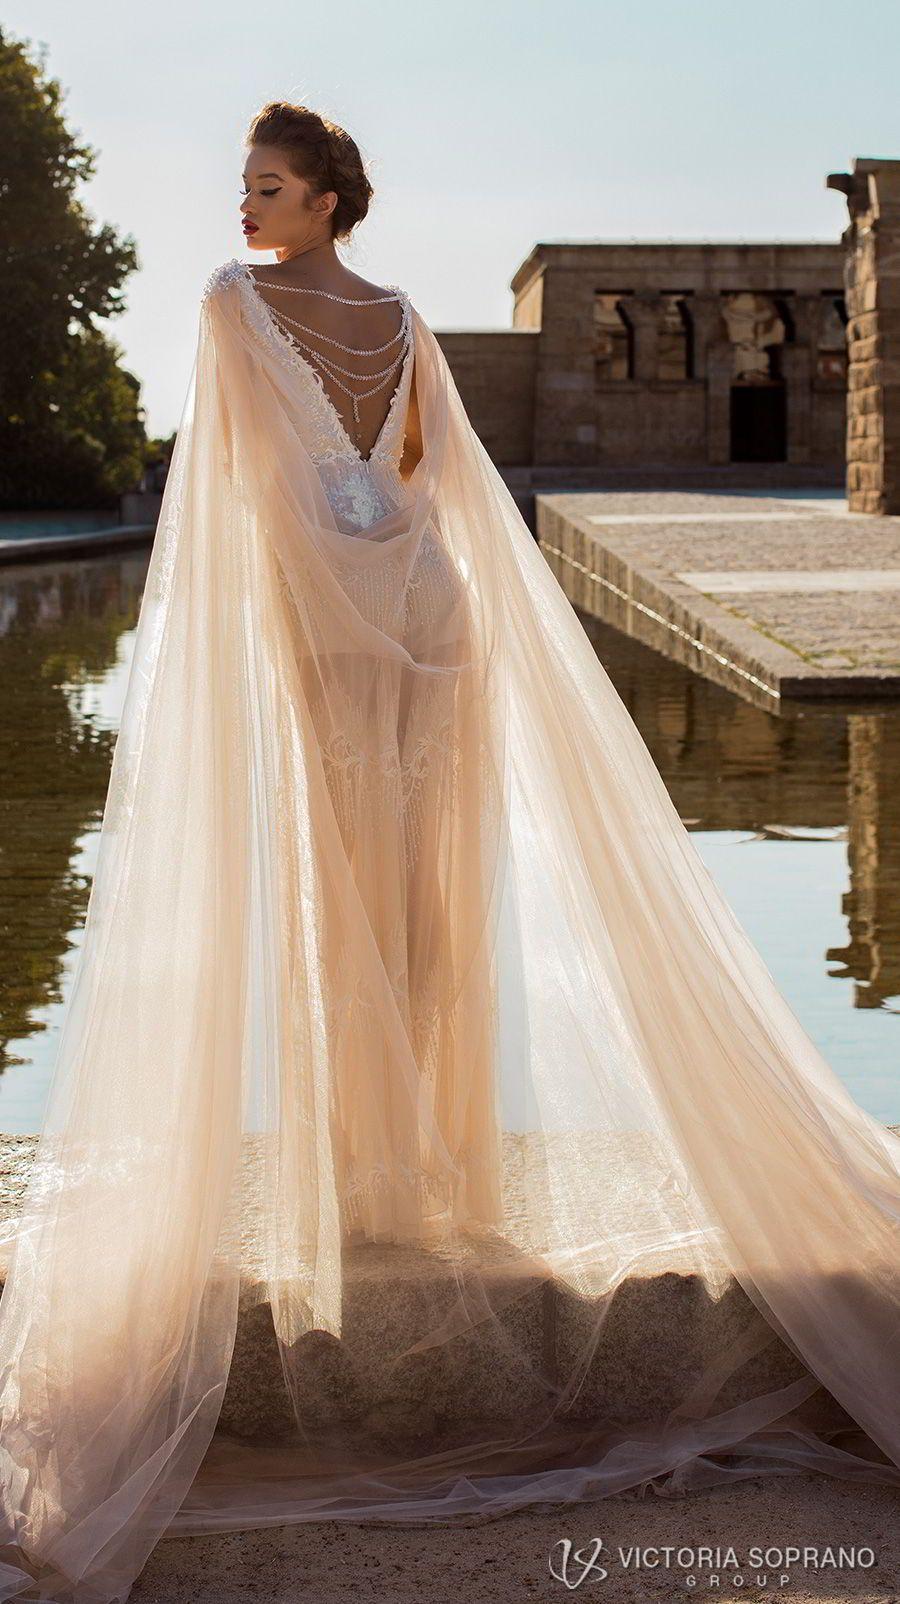 Victoria soprano wedding dresses u ucthe oneud bridal collection